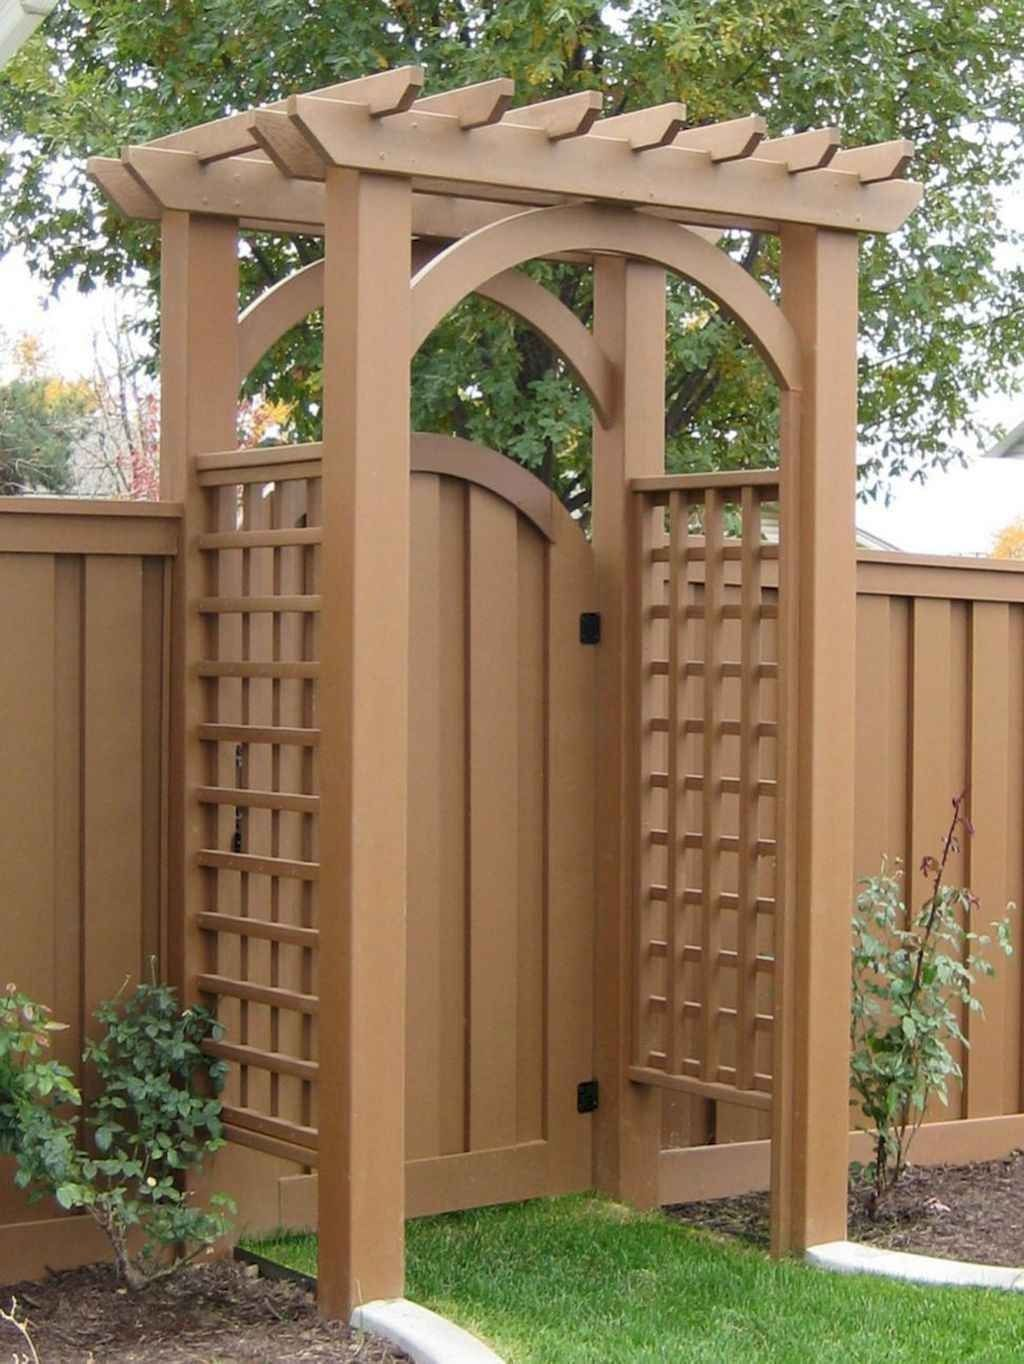 70 Gorgeous Backyard Privacy Fence Decor Ideas on A Budget ...